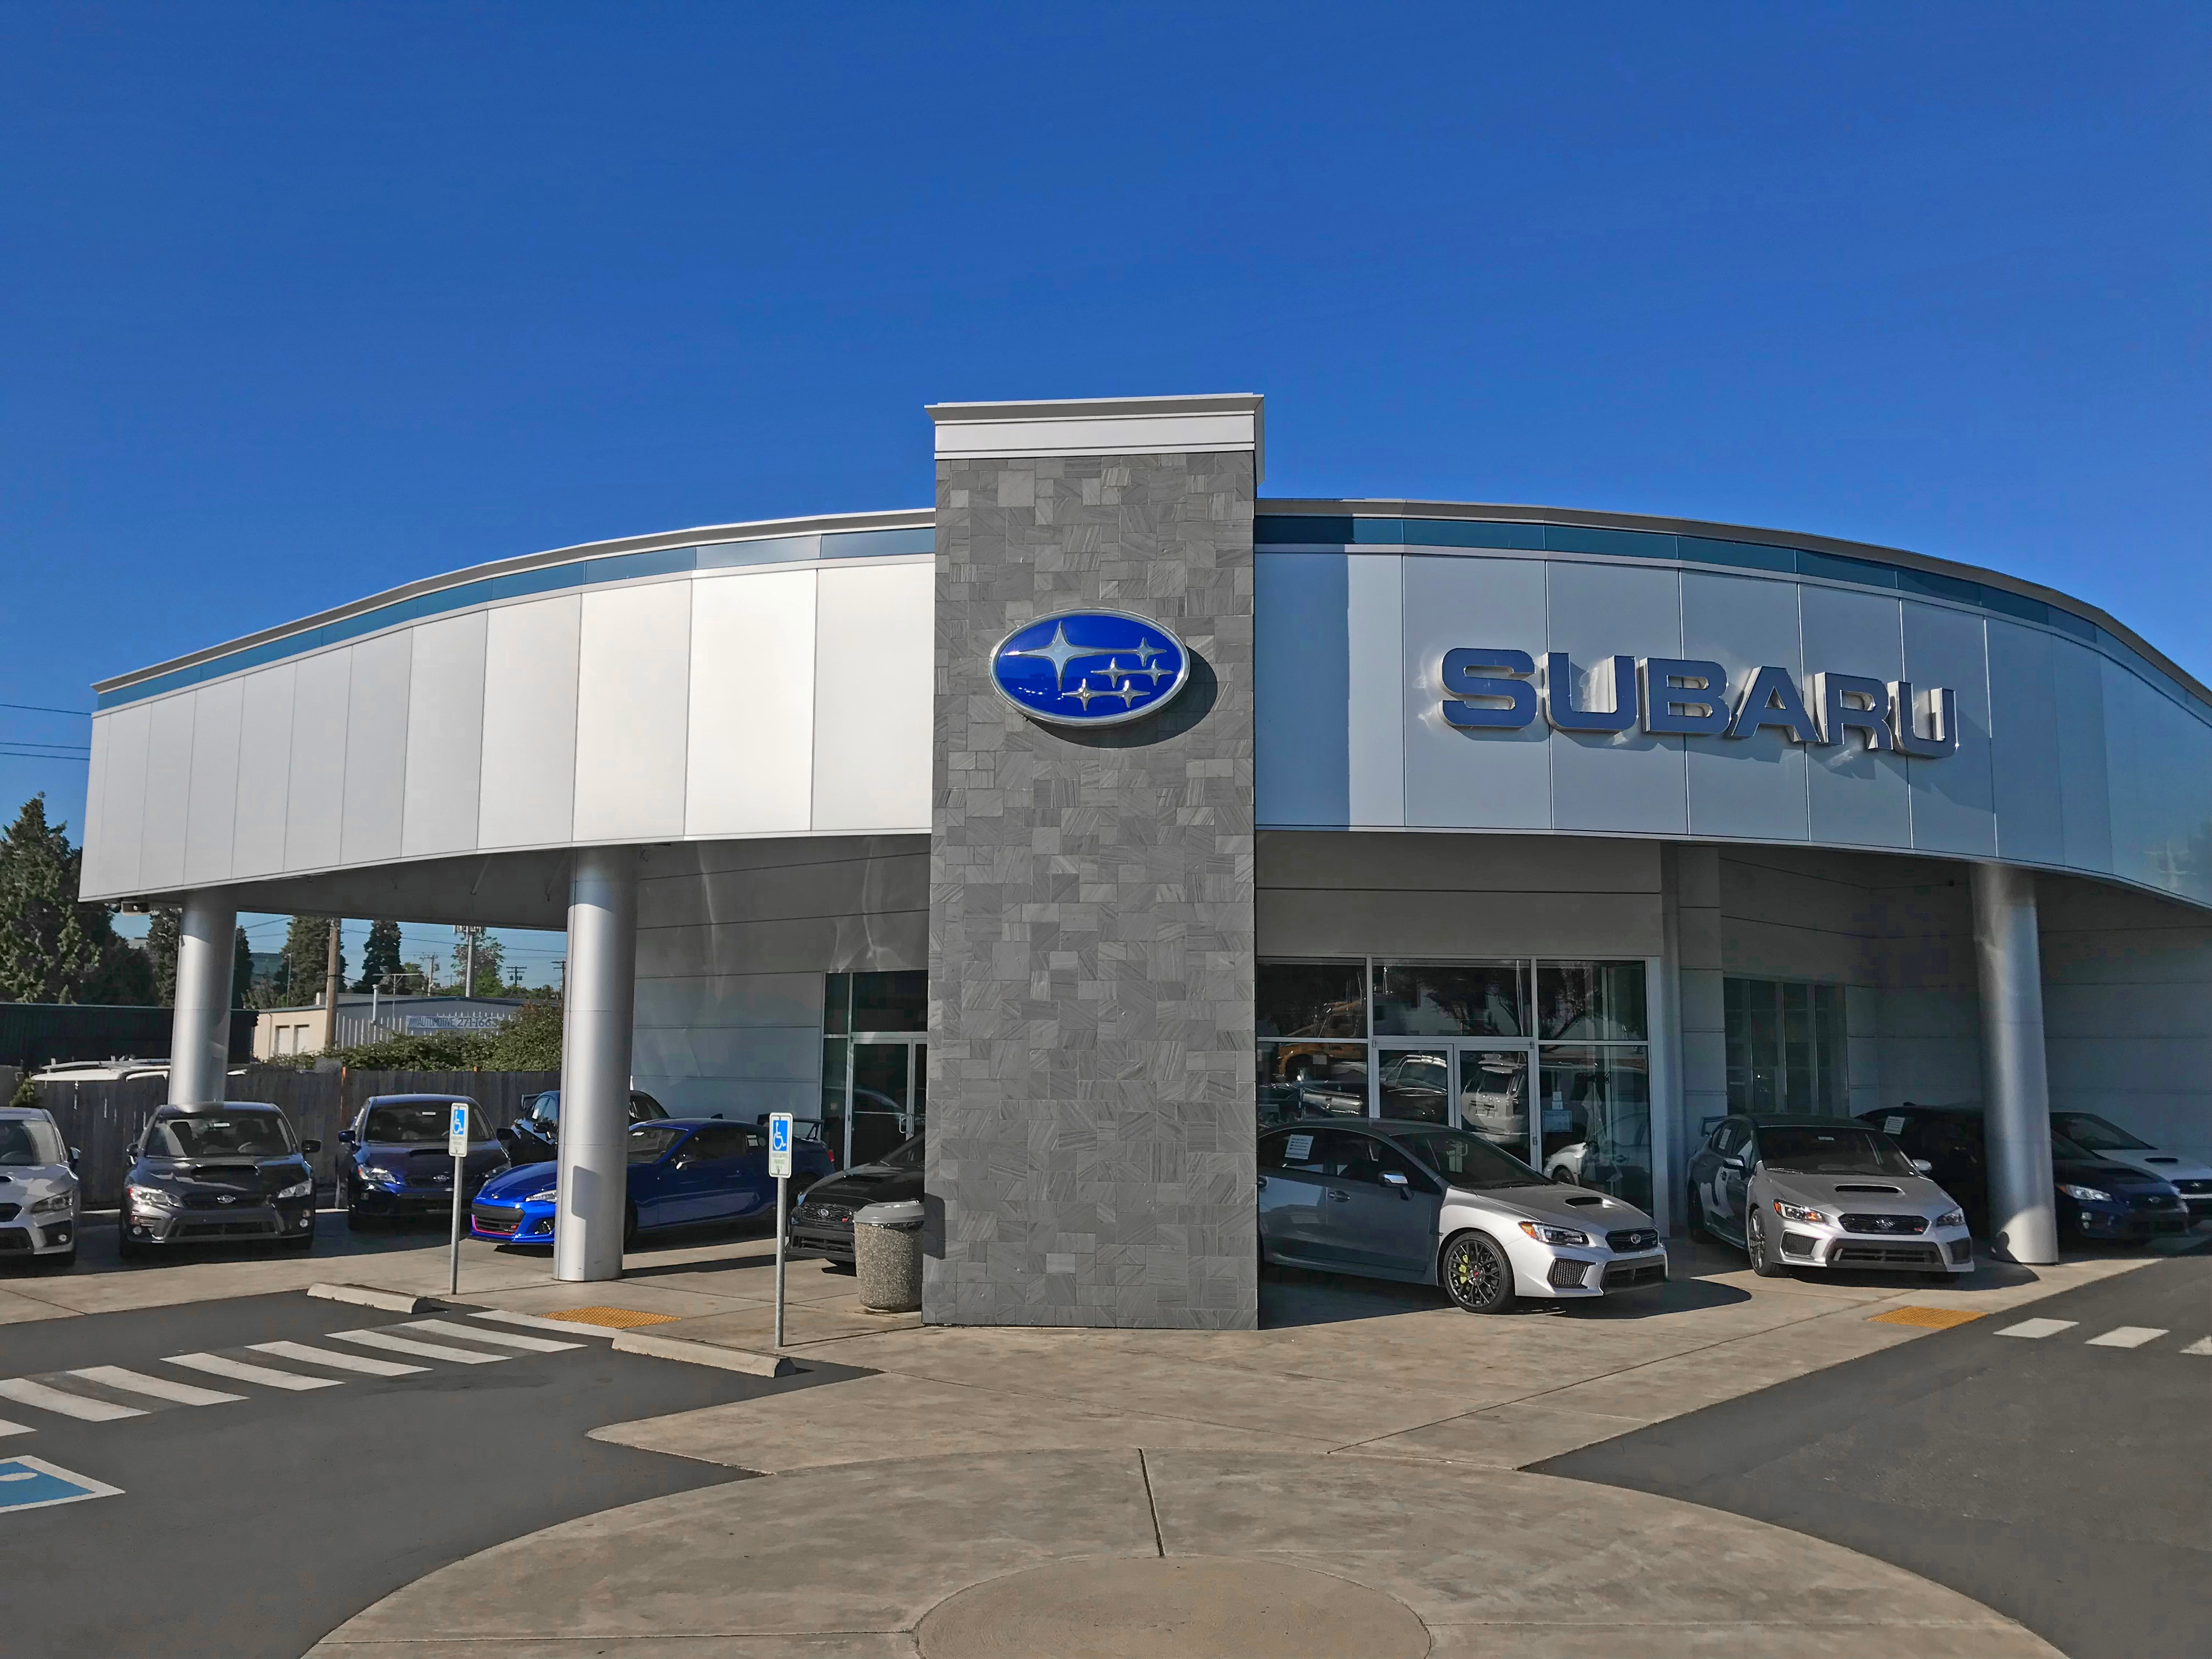 Walker S Renton Subaru Renton Wa New Used Subaru Dealership